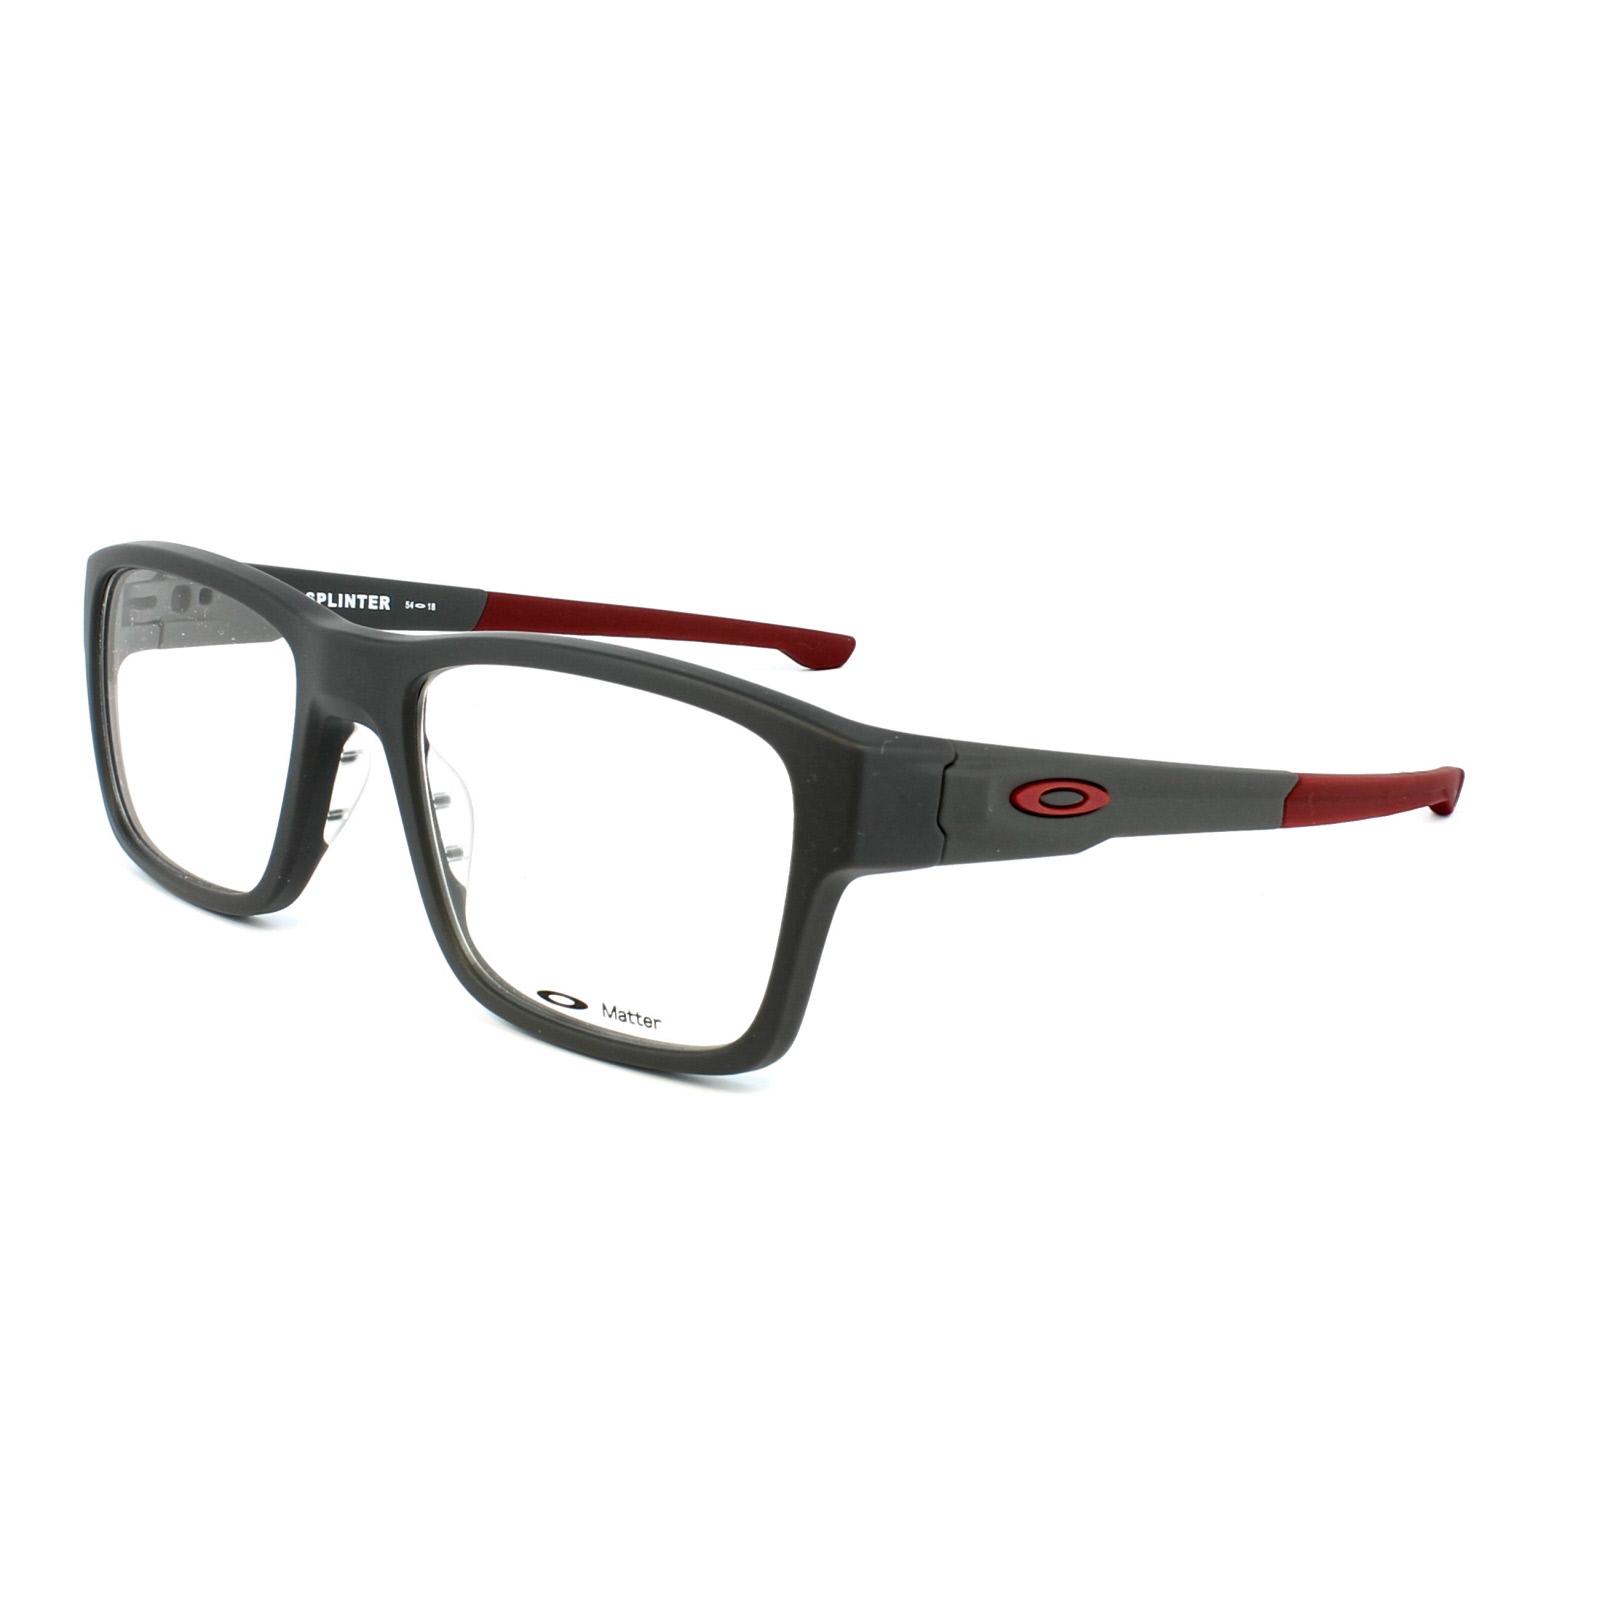 4a30c4c83e Cheap Oakley Splinter Glasses Frames - Discounted Sunglasses